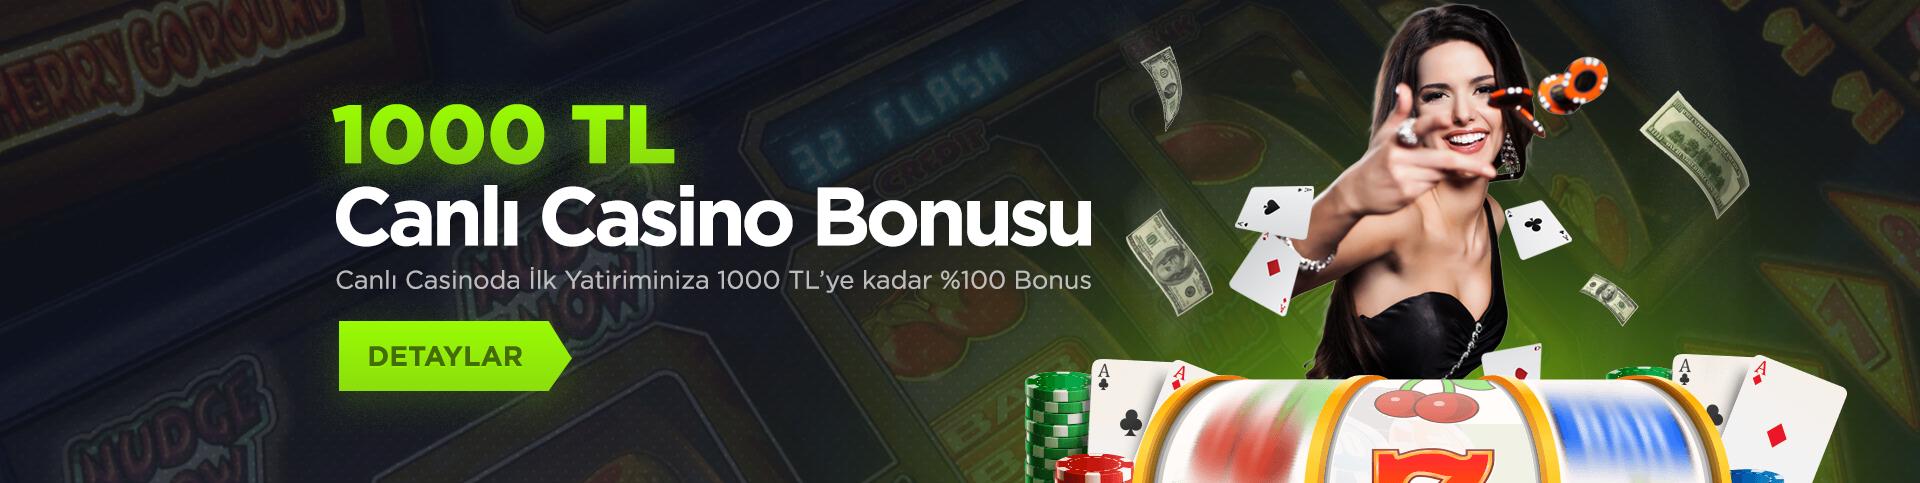 Noktabet- Casino %100 Bonus